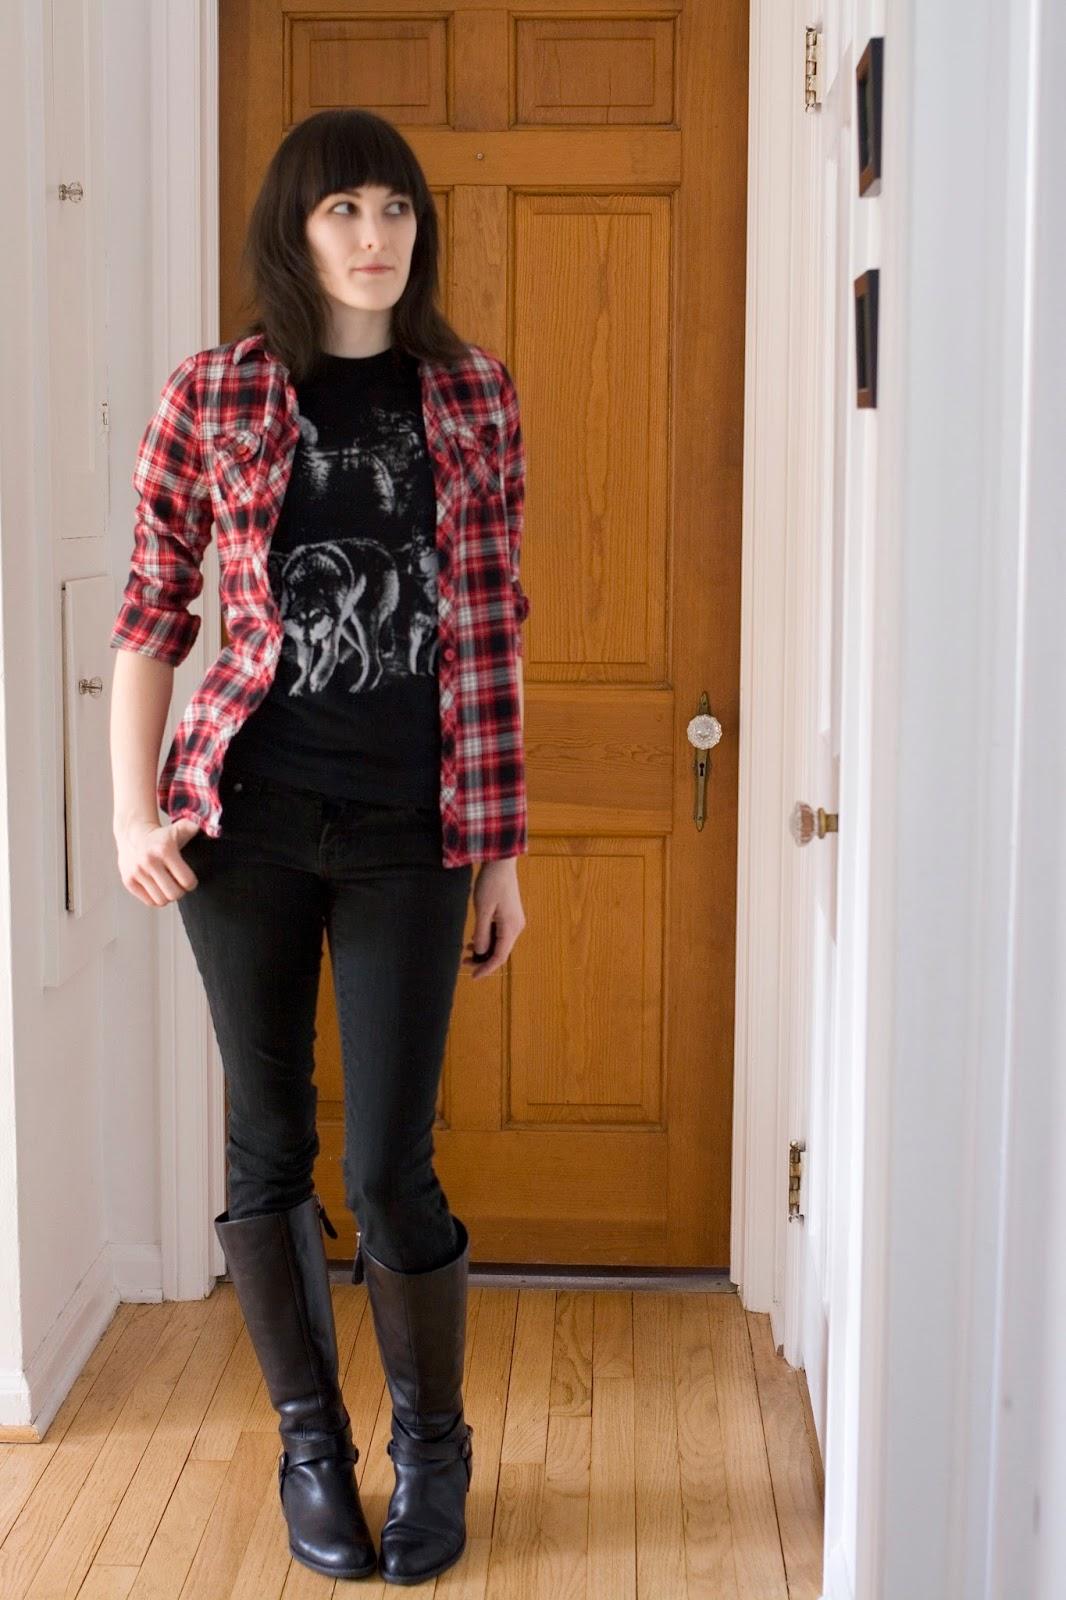 Plaid shirt: OP/Ocean Pacific - Tee: Random shady vendor - Jeans: Grane - Boots: Franco Sarto - www.bombasine.com